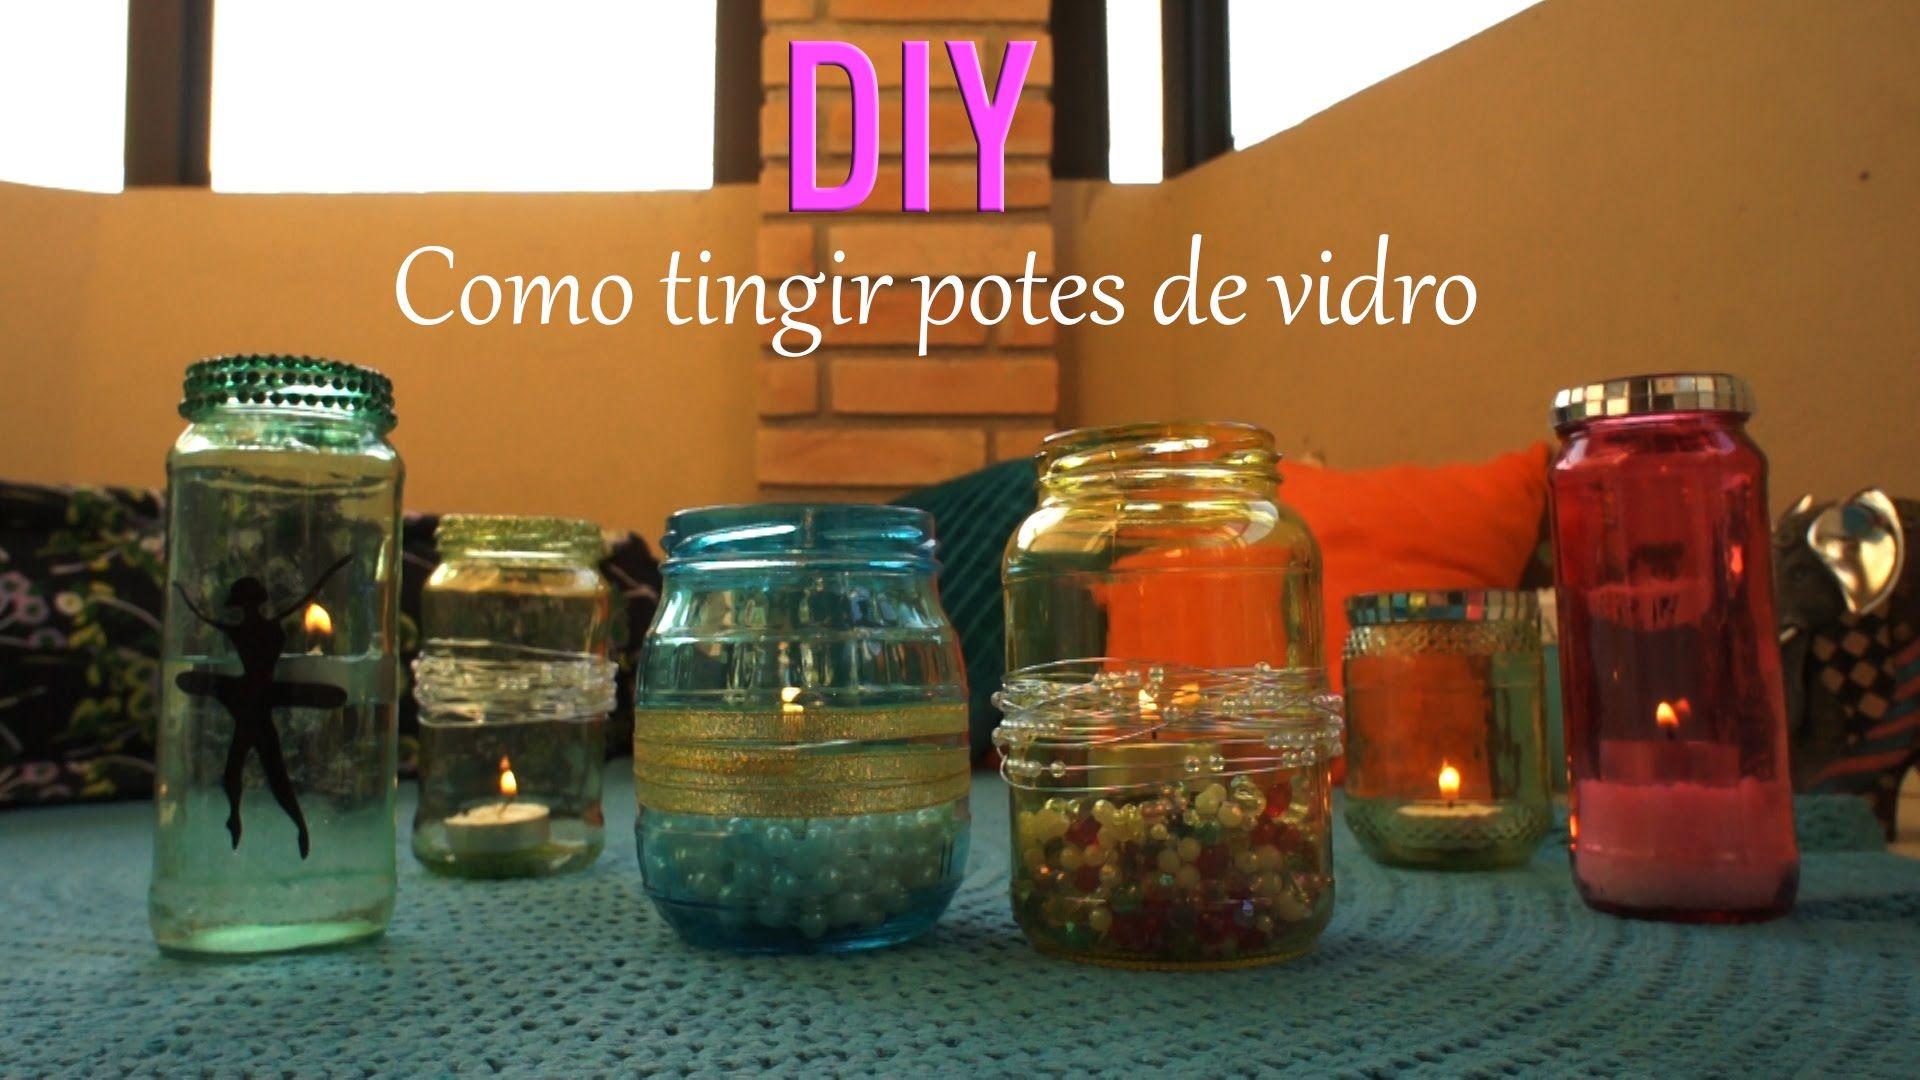 DIY: COMO TINGIR POTES DE VIDRO